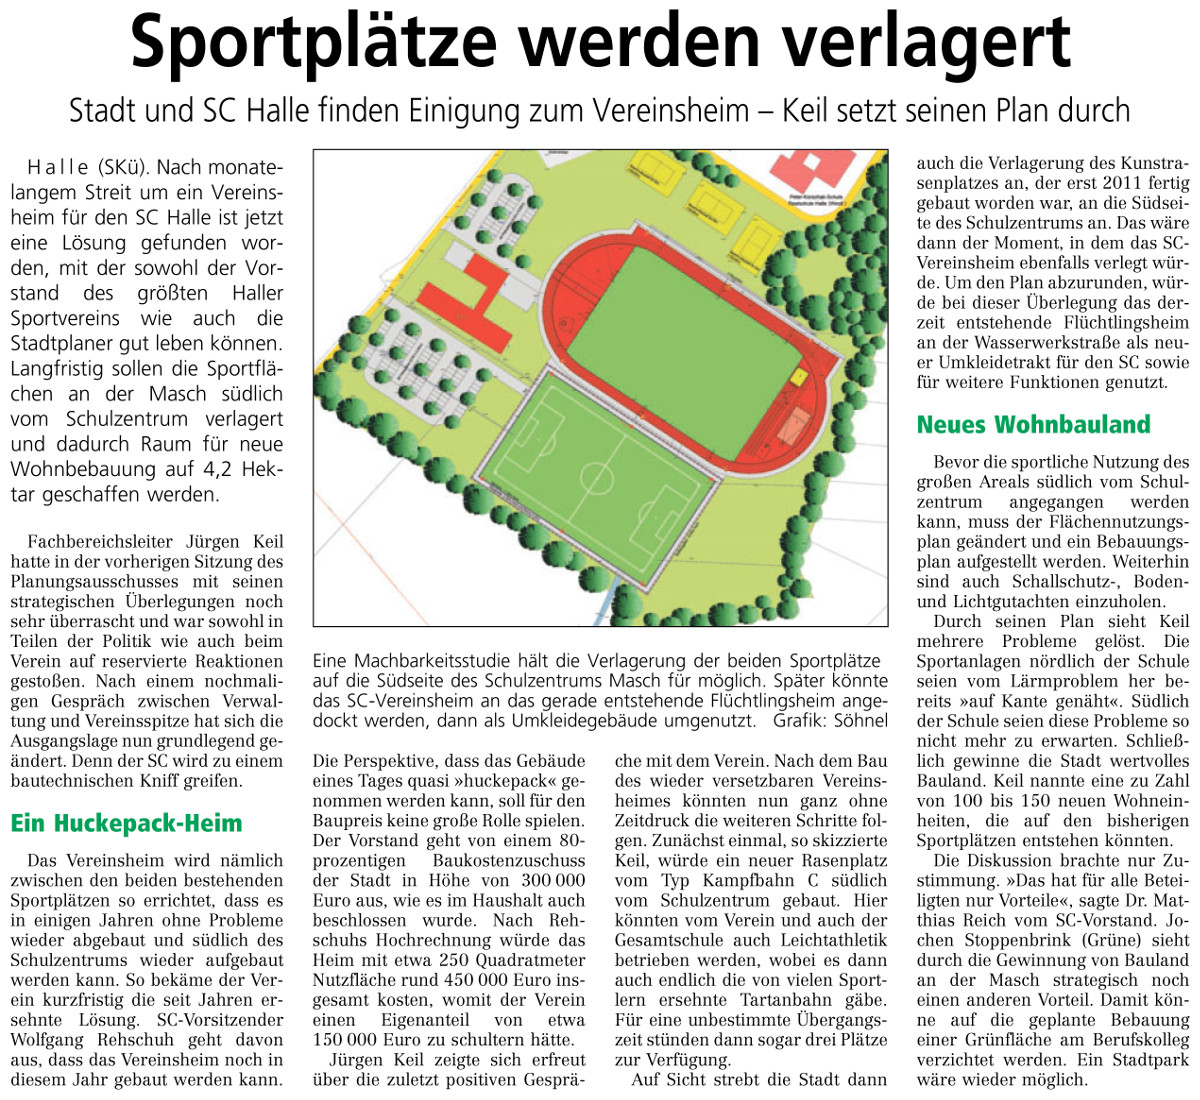 20160227 - WB - Sportplätze werden verlagert - 1200x